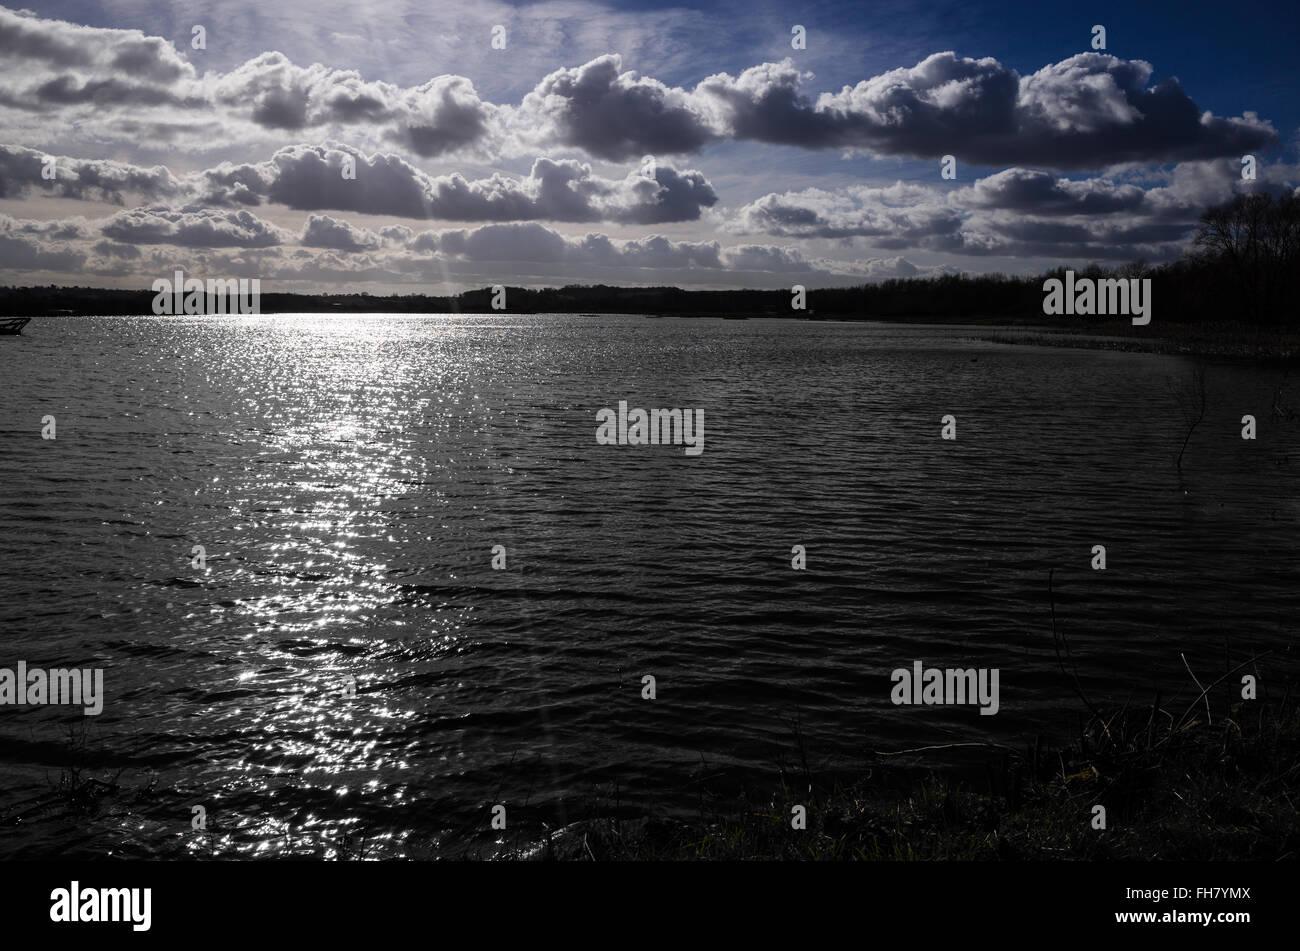 Sunlight on water - Stock Image